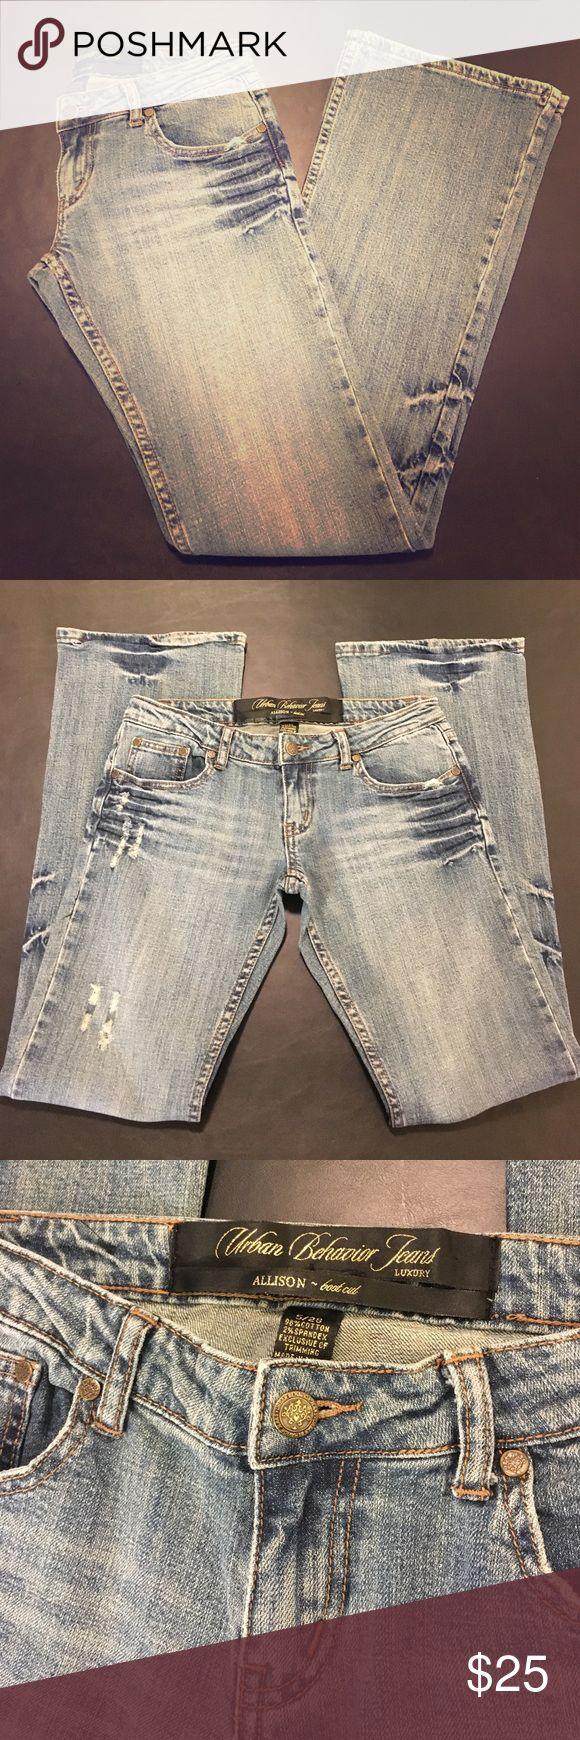 "URBAN BEHAVIOR LUXURY Jeans Allison Boot Cut 5/28 Cotton-spandex blend. Boot cut. Low rise. Distressed, light-medium wash. Luxury jeans. ""Allison"" jeans. 71B-1899563. Women's size 5/28. Urban Behavior Jeans Boot Cut"